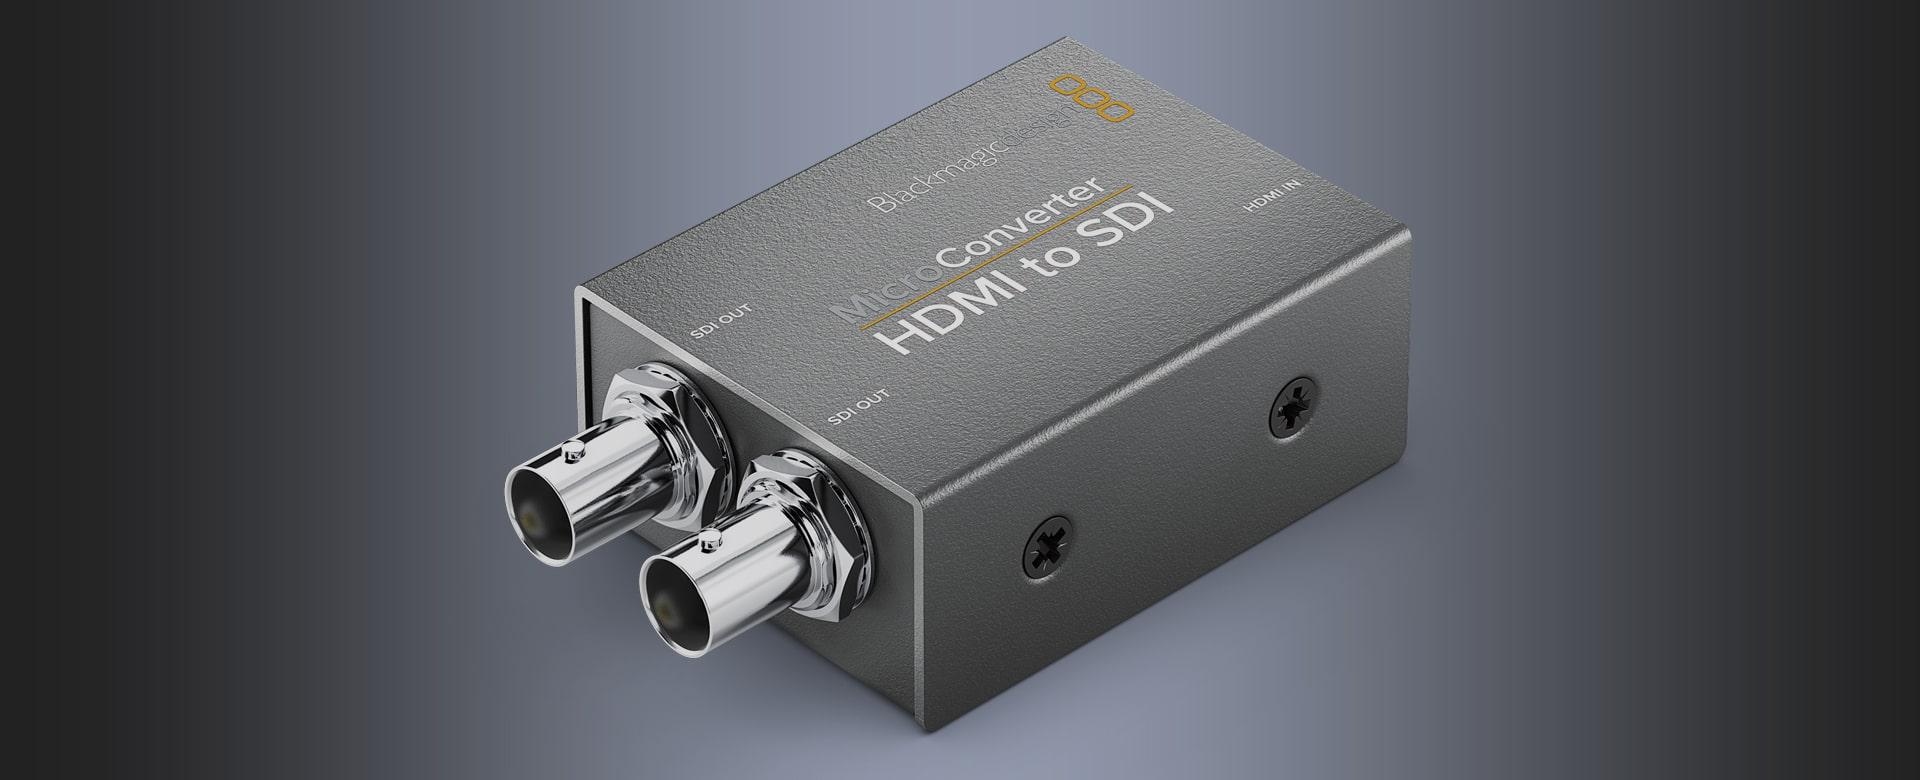 Micro Converter Hdmi To Sdi 20 Pack